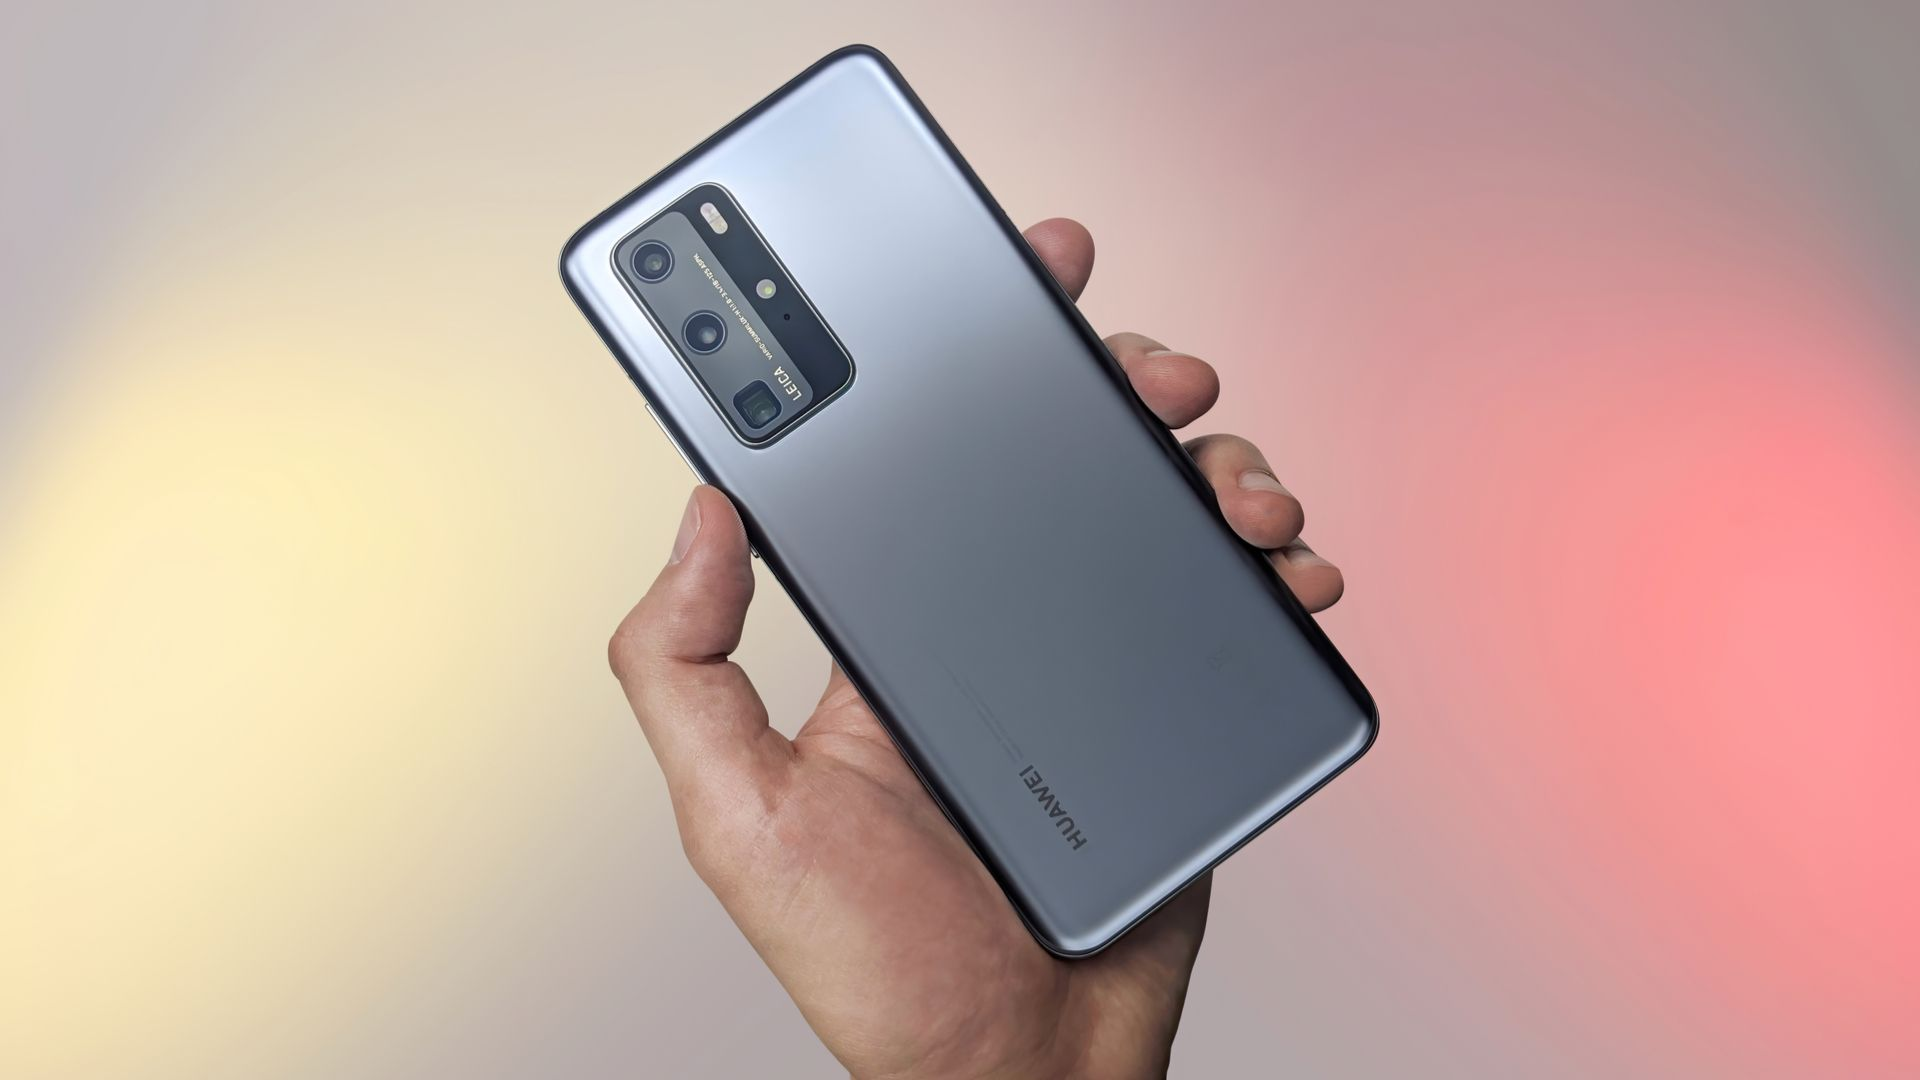 Huawei P40 Pro tem sensor de 50 megapixels. (Imagem: Mr.Mikla/Shutterstock)